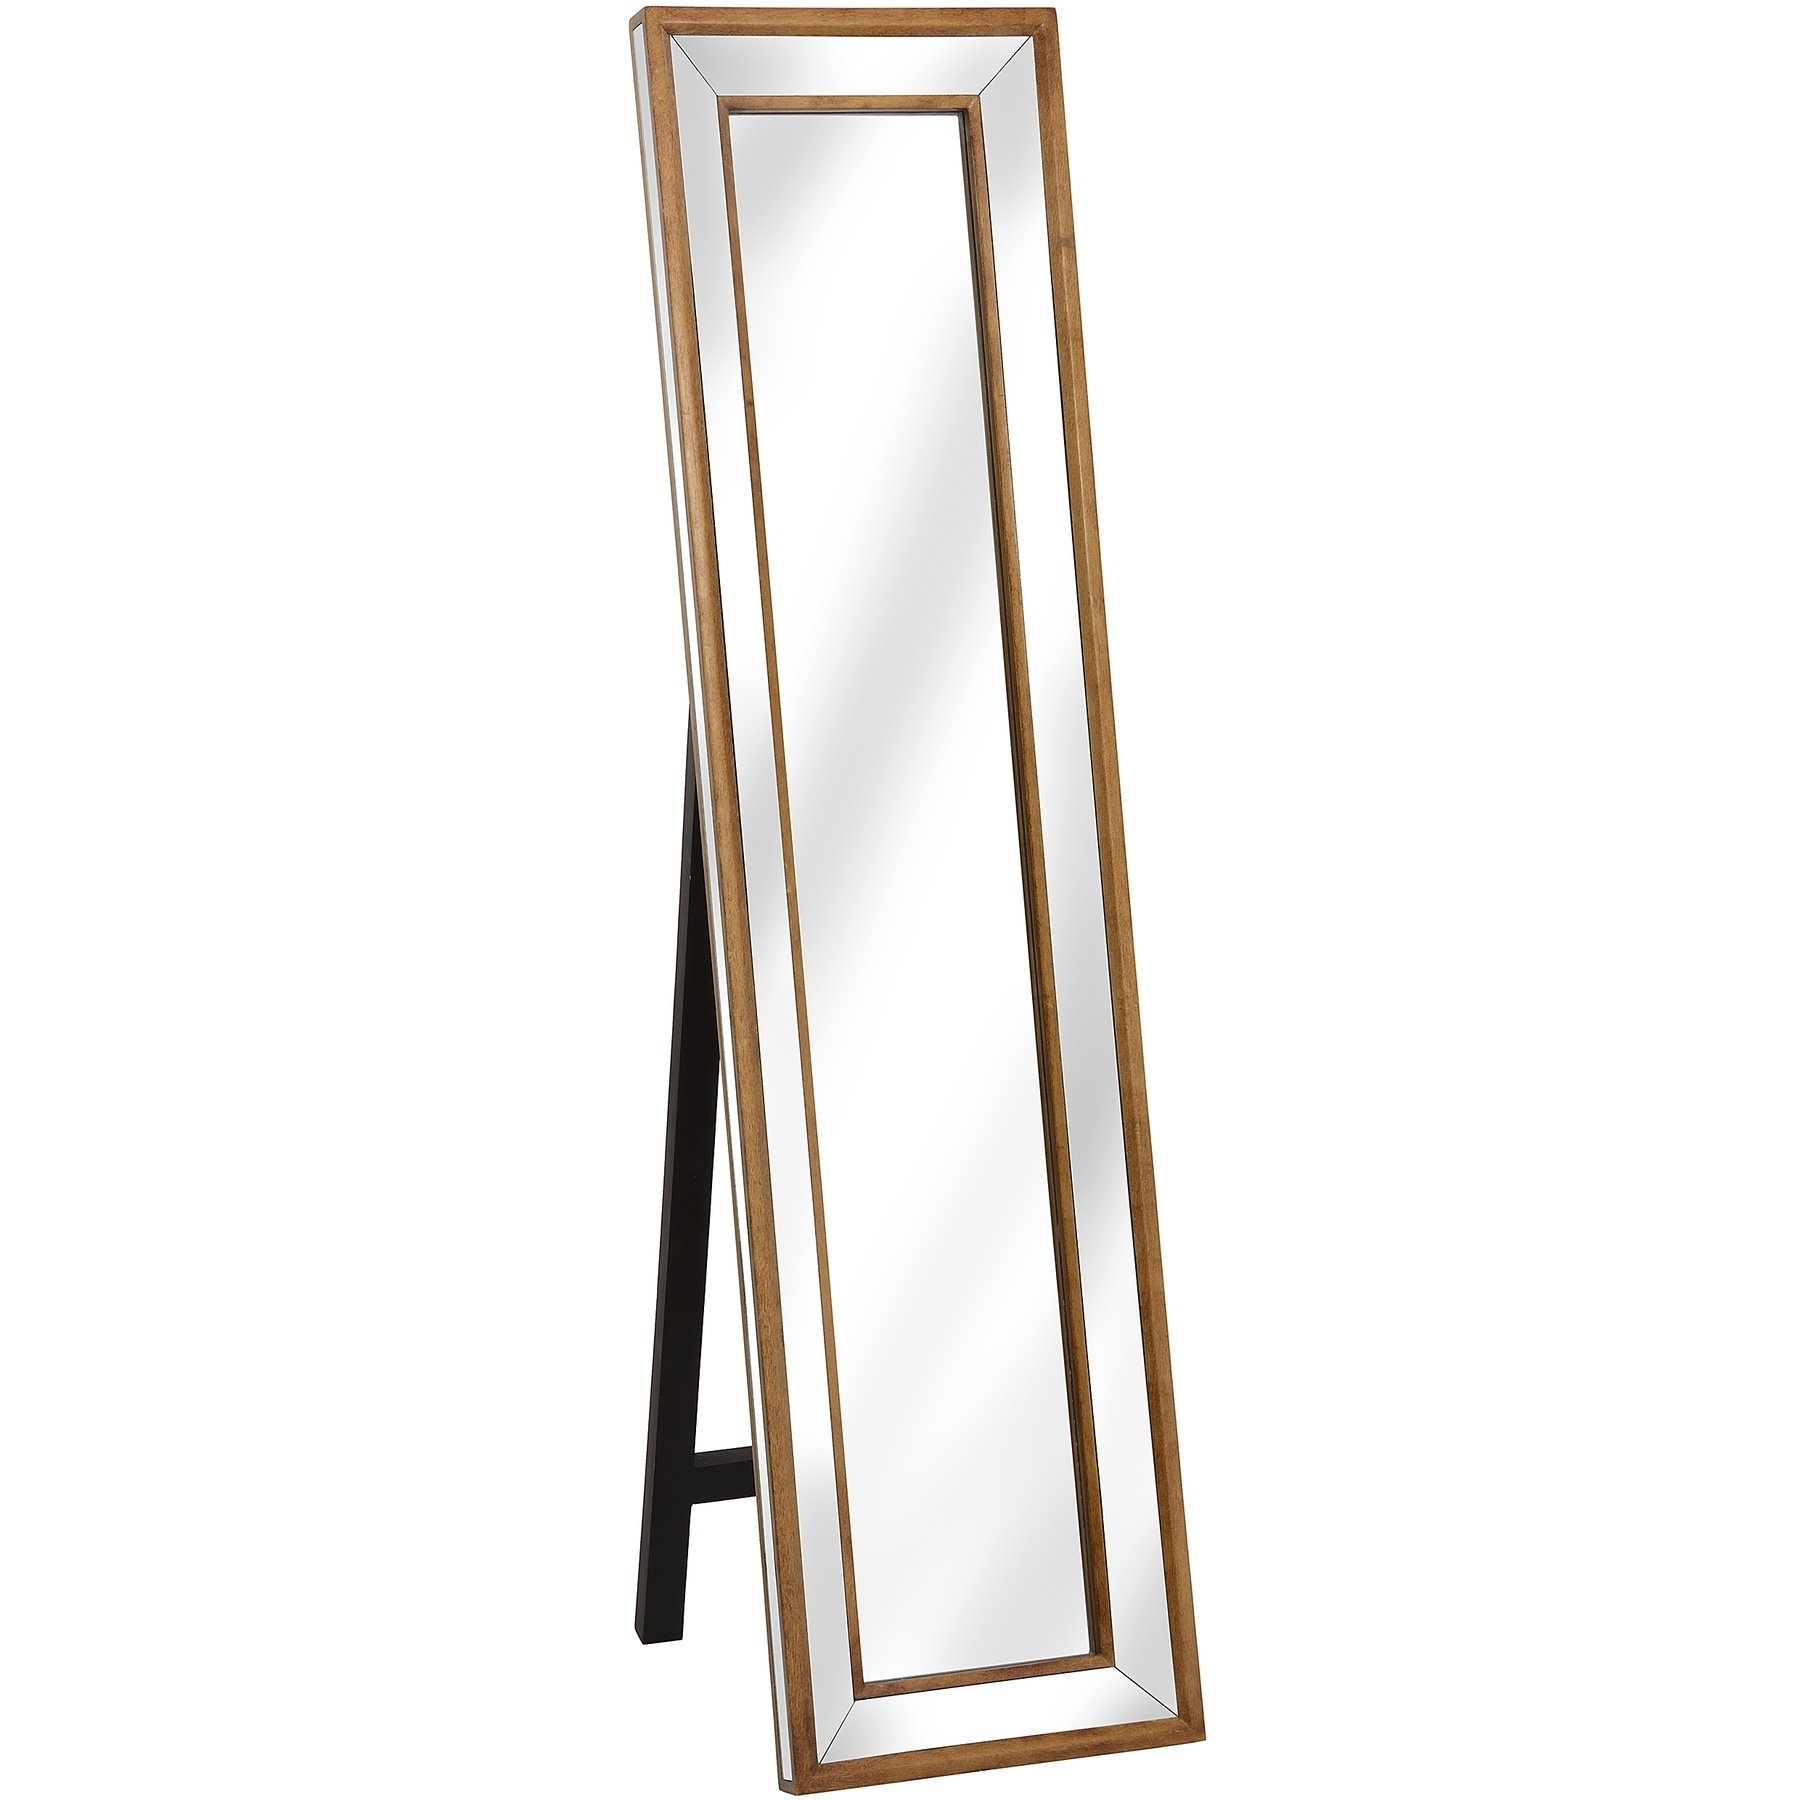 Hill Interiors Venetian Full Length Mirror Wayfaircouk For Venetian Full Length Mirror (View 6 of 15)